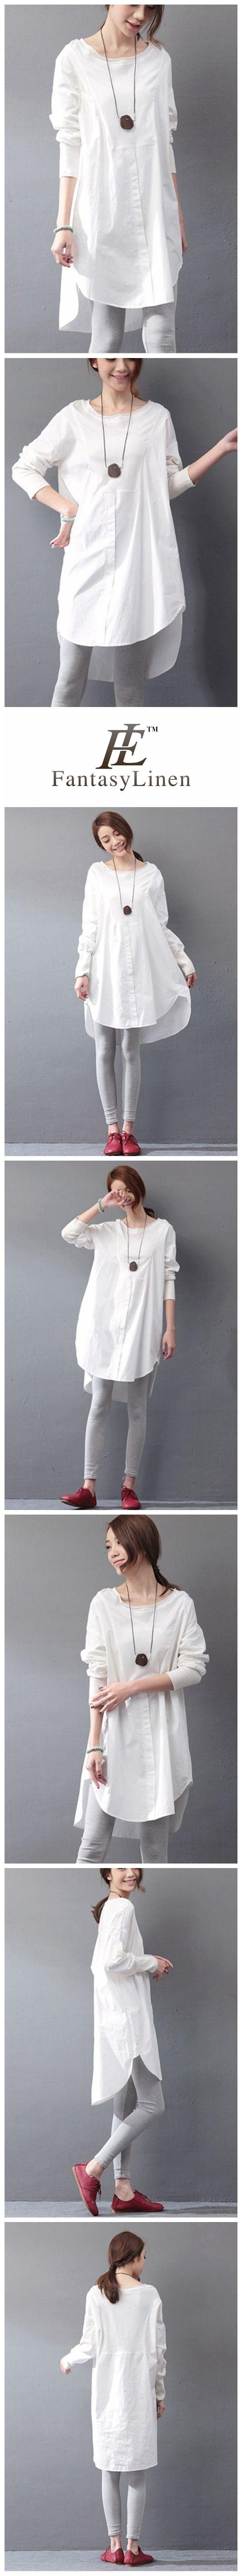 Cotton White Dress Women Clothes SC604